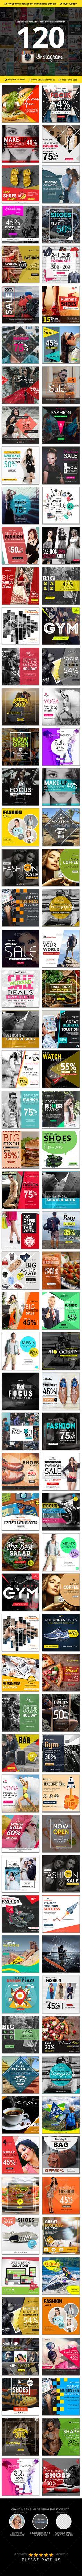 120 Instagram Promotional Design Template PSD. Download here: https://graphicriver.net/item/120-instagram-promotional/16976599?s_rank=286&ref=yinkira